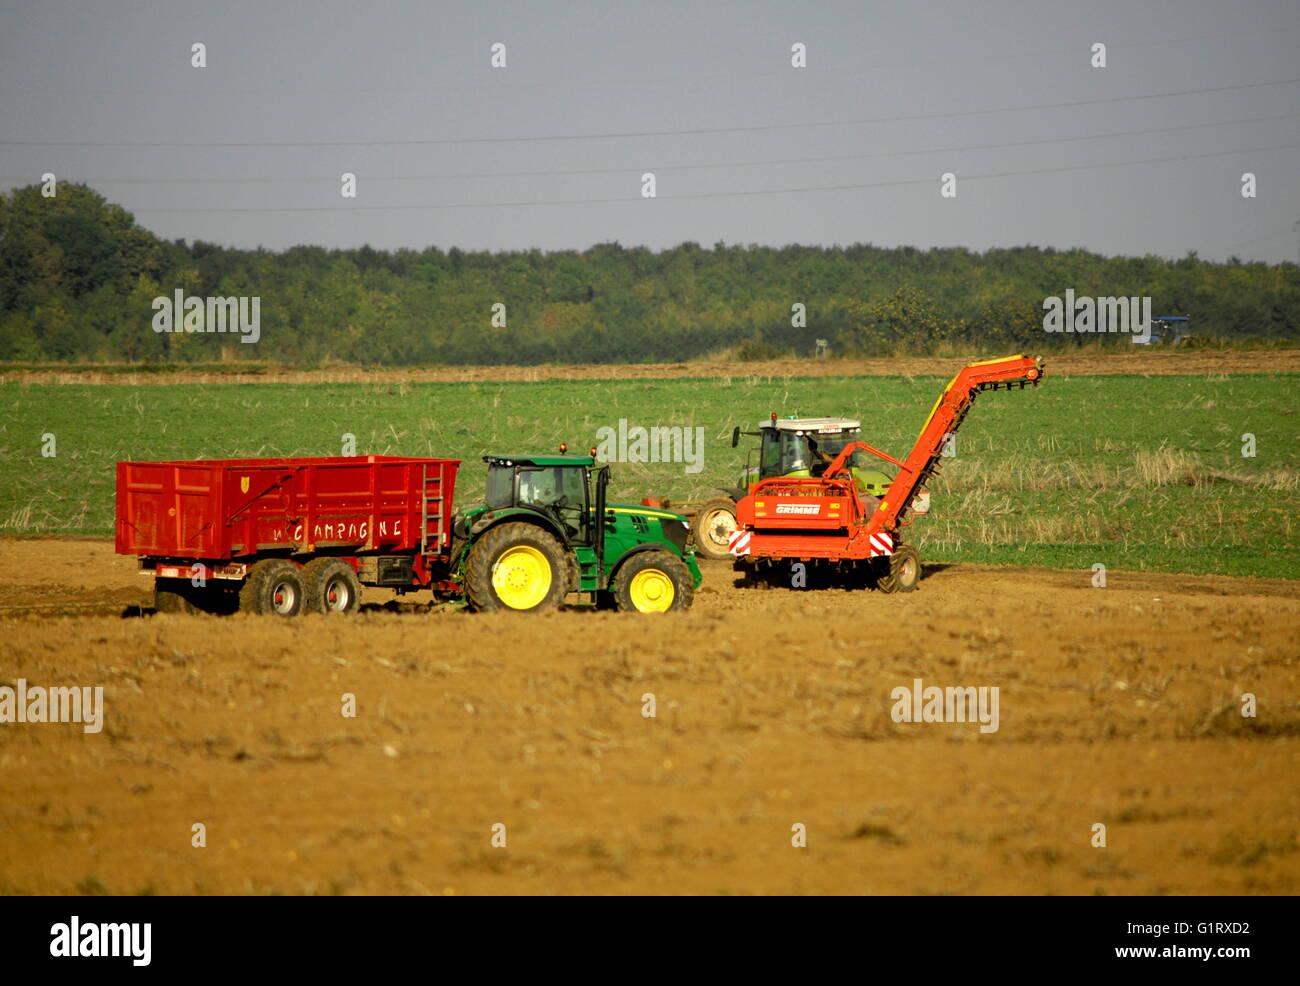 AJAXNETPHOTO. PICARDY, FRANCE. - AGRICULTURE - HARVESTING POTATOES ON THE SOMME.  PHOTO:JONATHAN EASTLAND/AJAX  Stock Photo